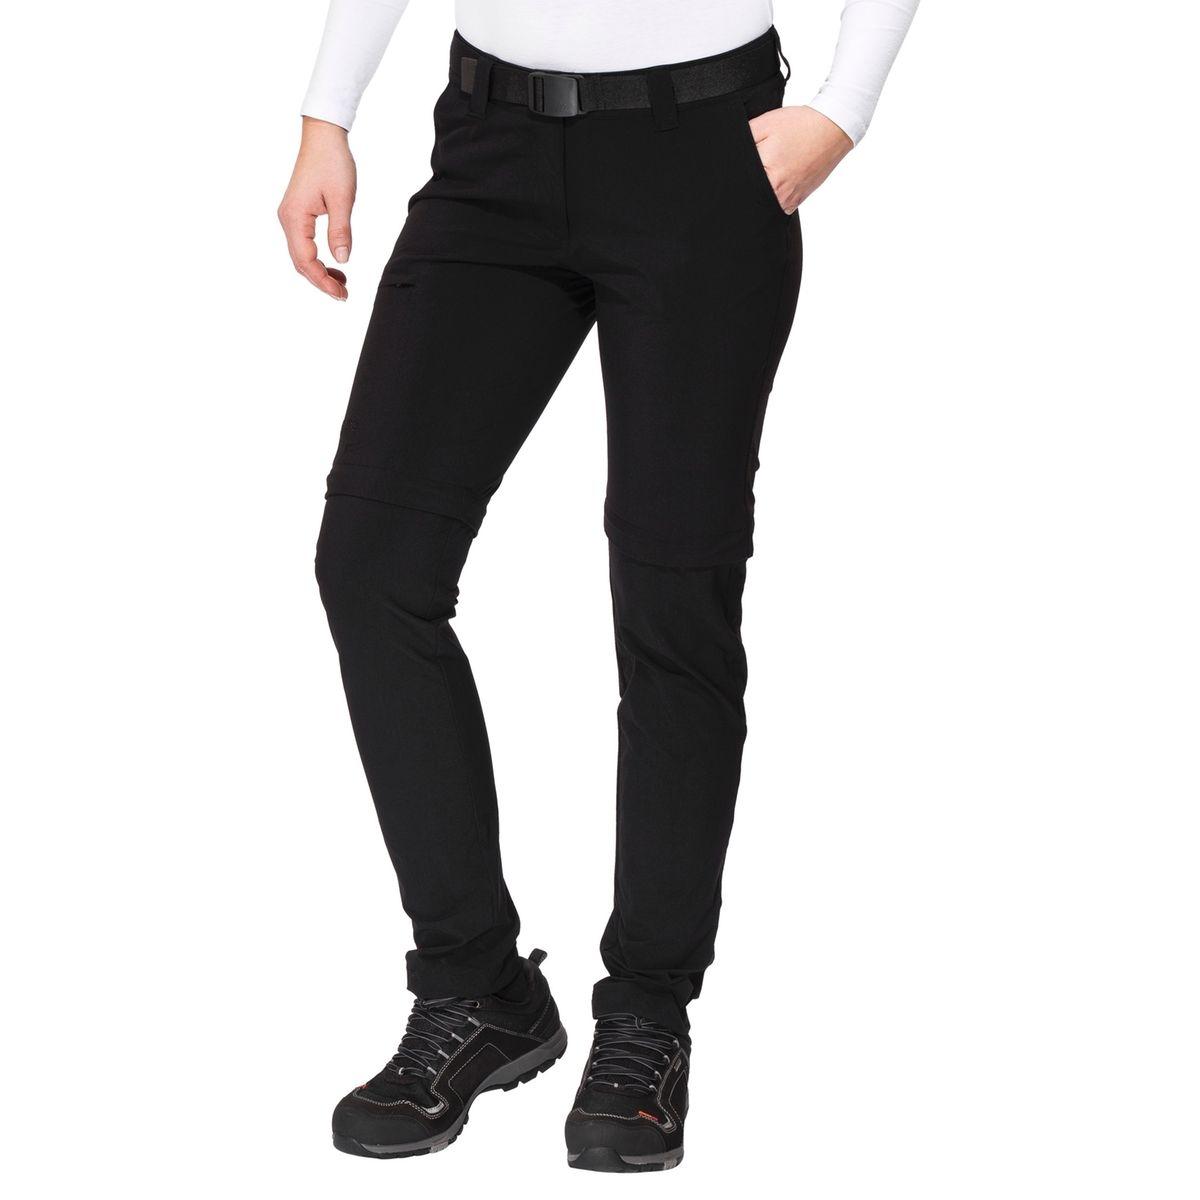 Inara Slim - Pantalon Femme - marron